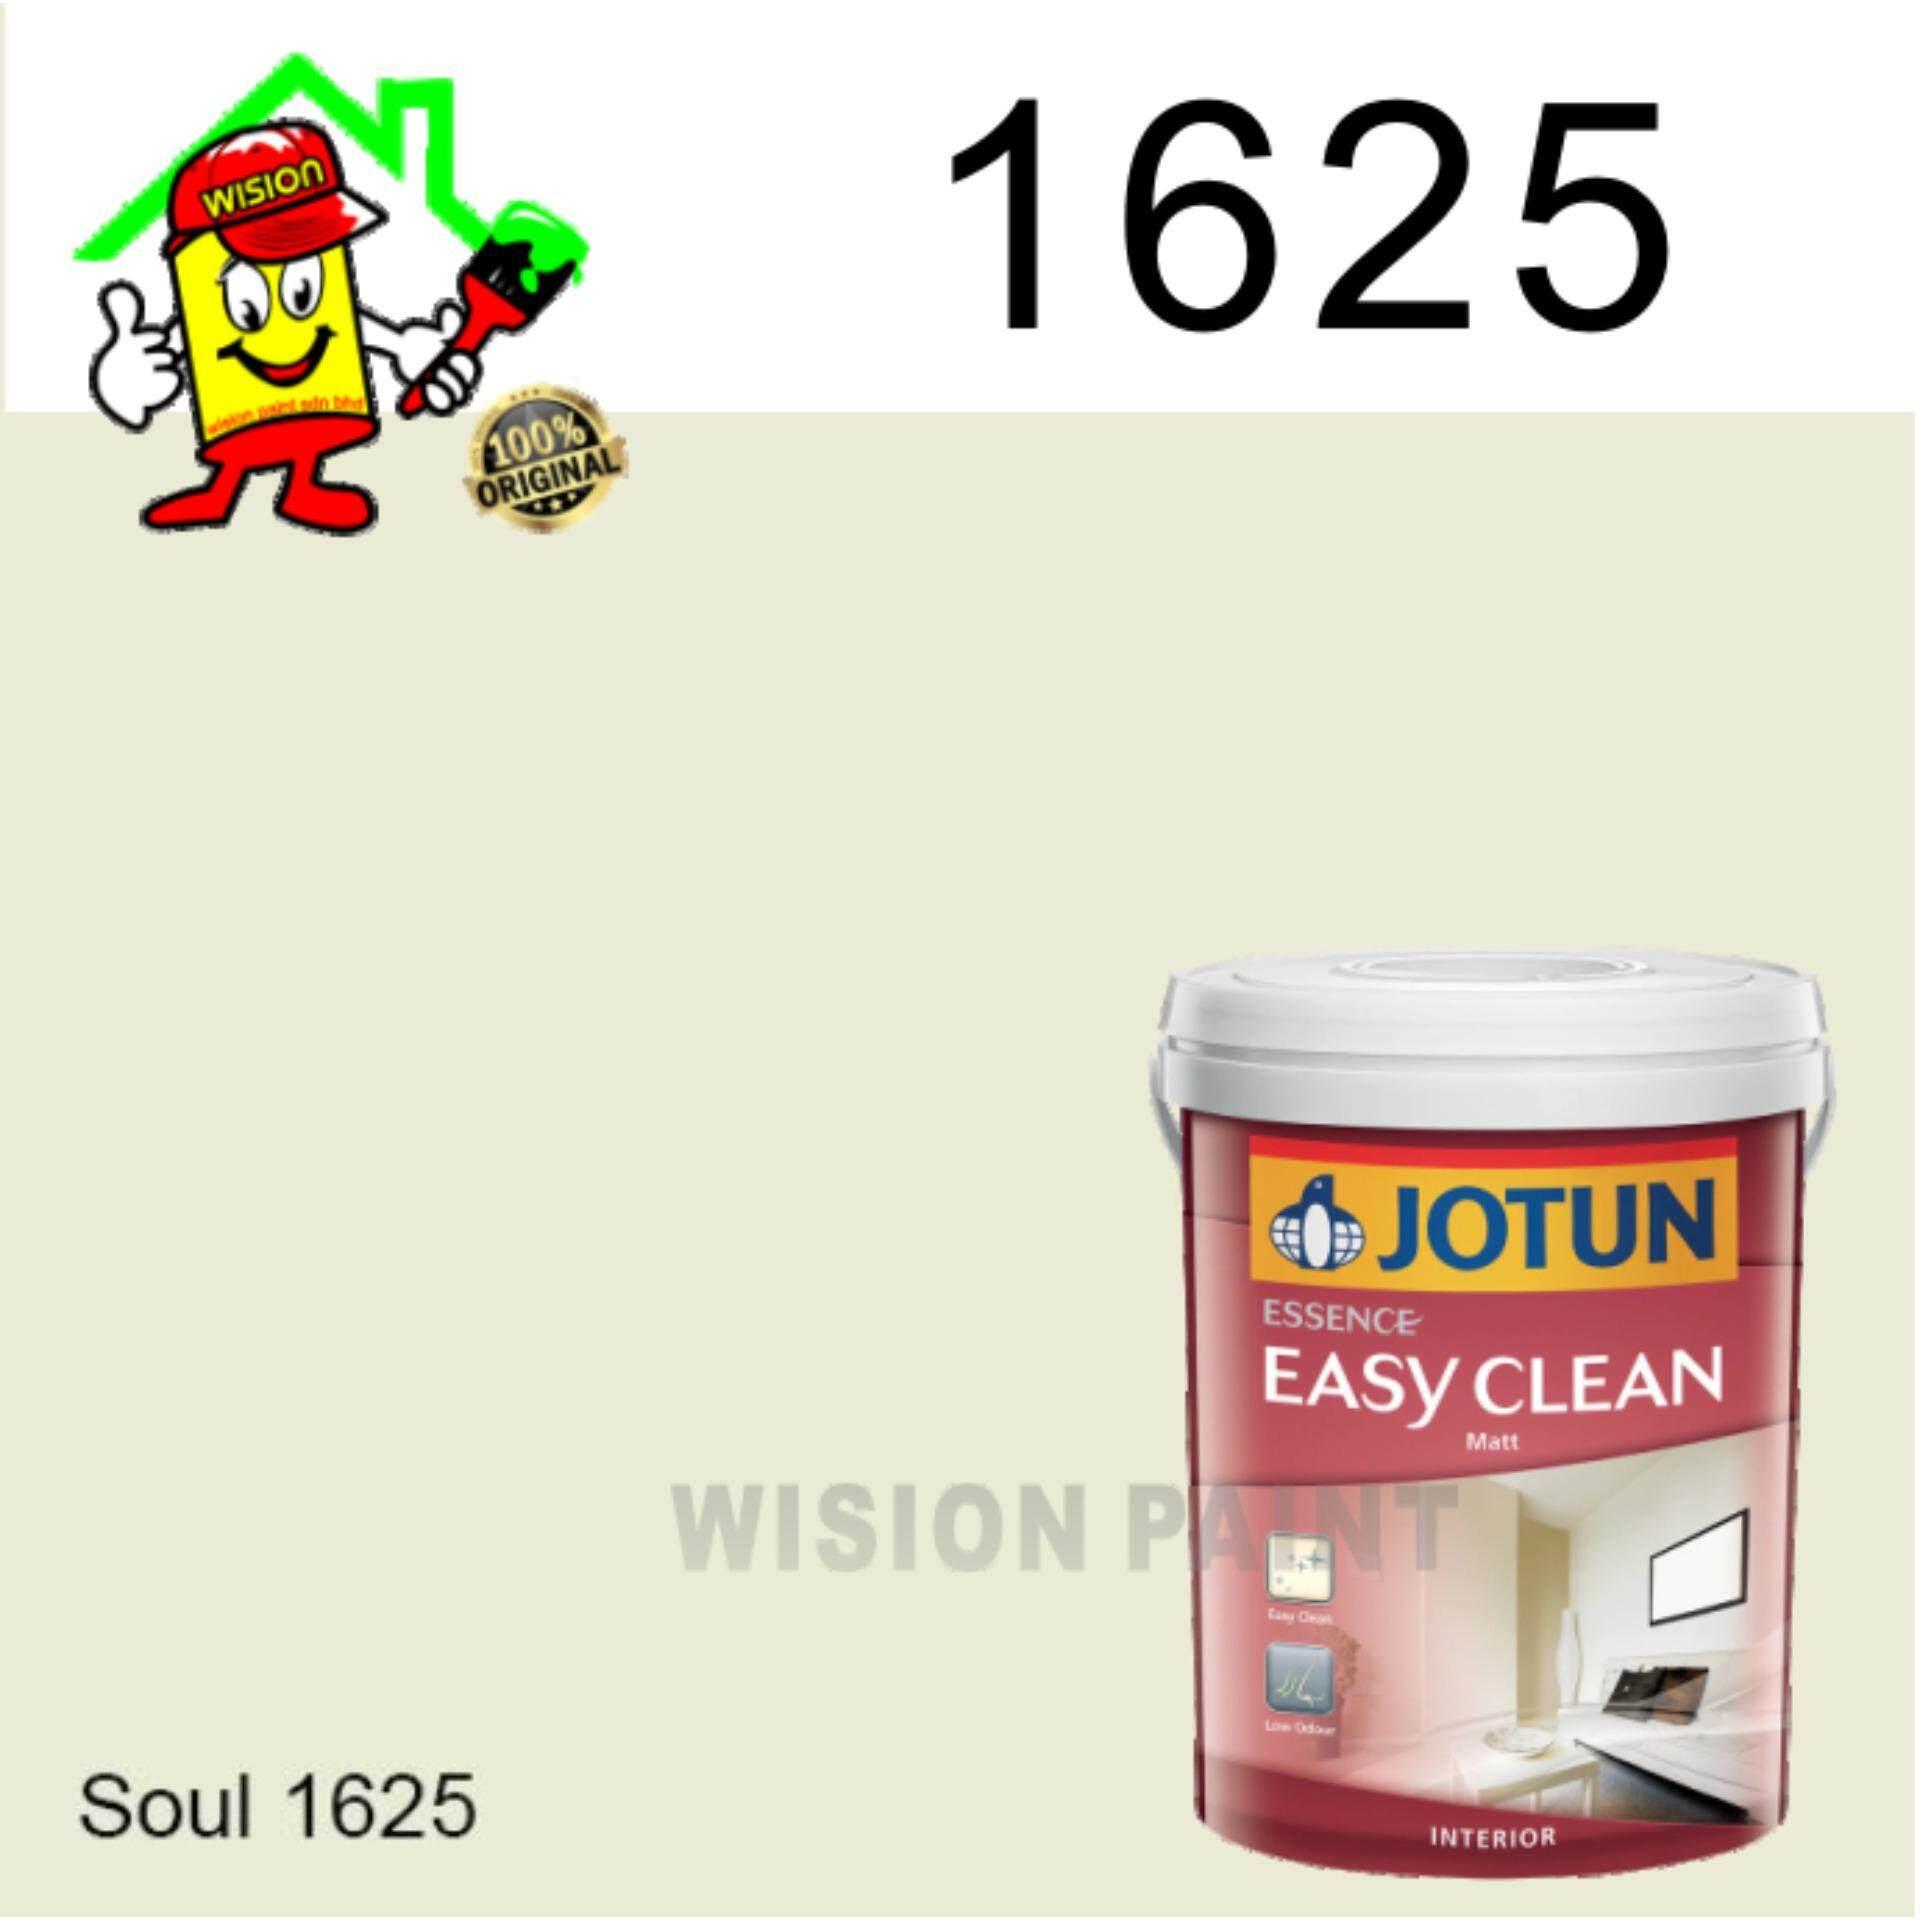 ESSENCE EASY CLEAN 5L - 1625 Soul • Jotun • Matt Finish • Interior • Walls  • Ceiling